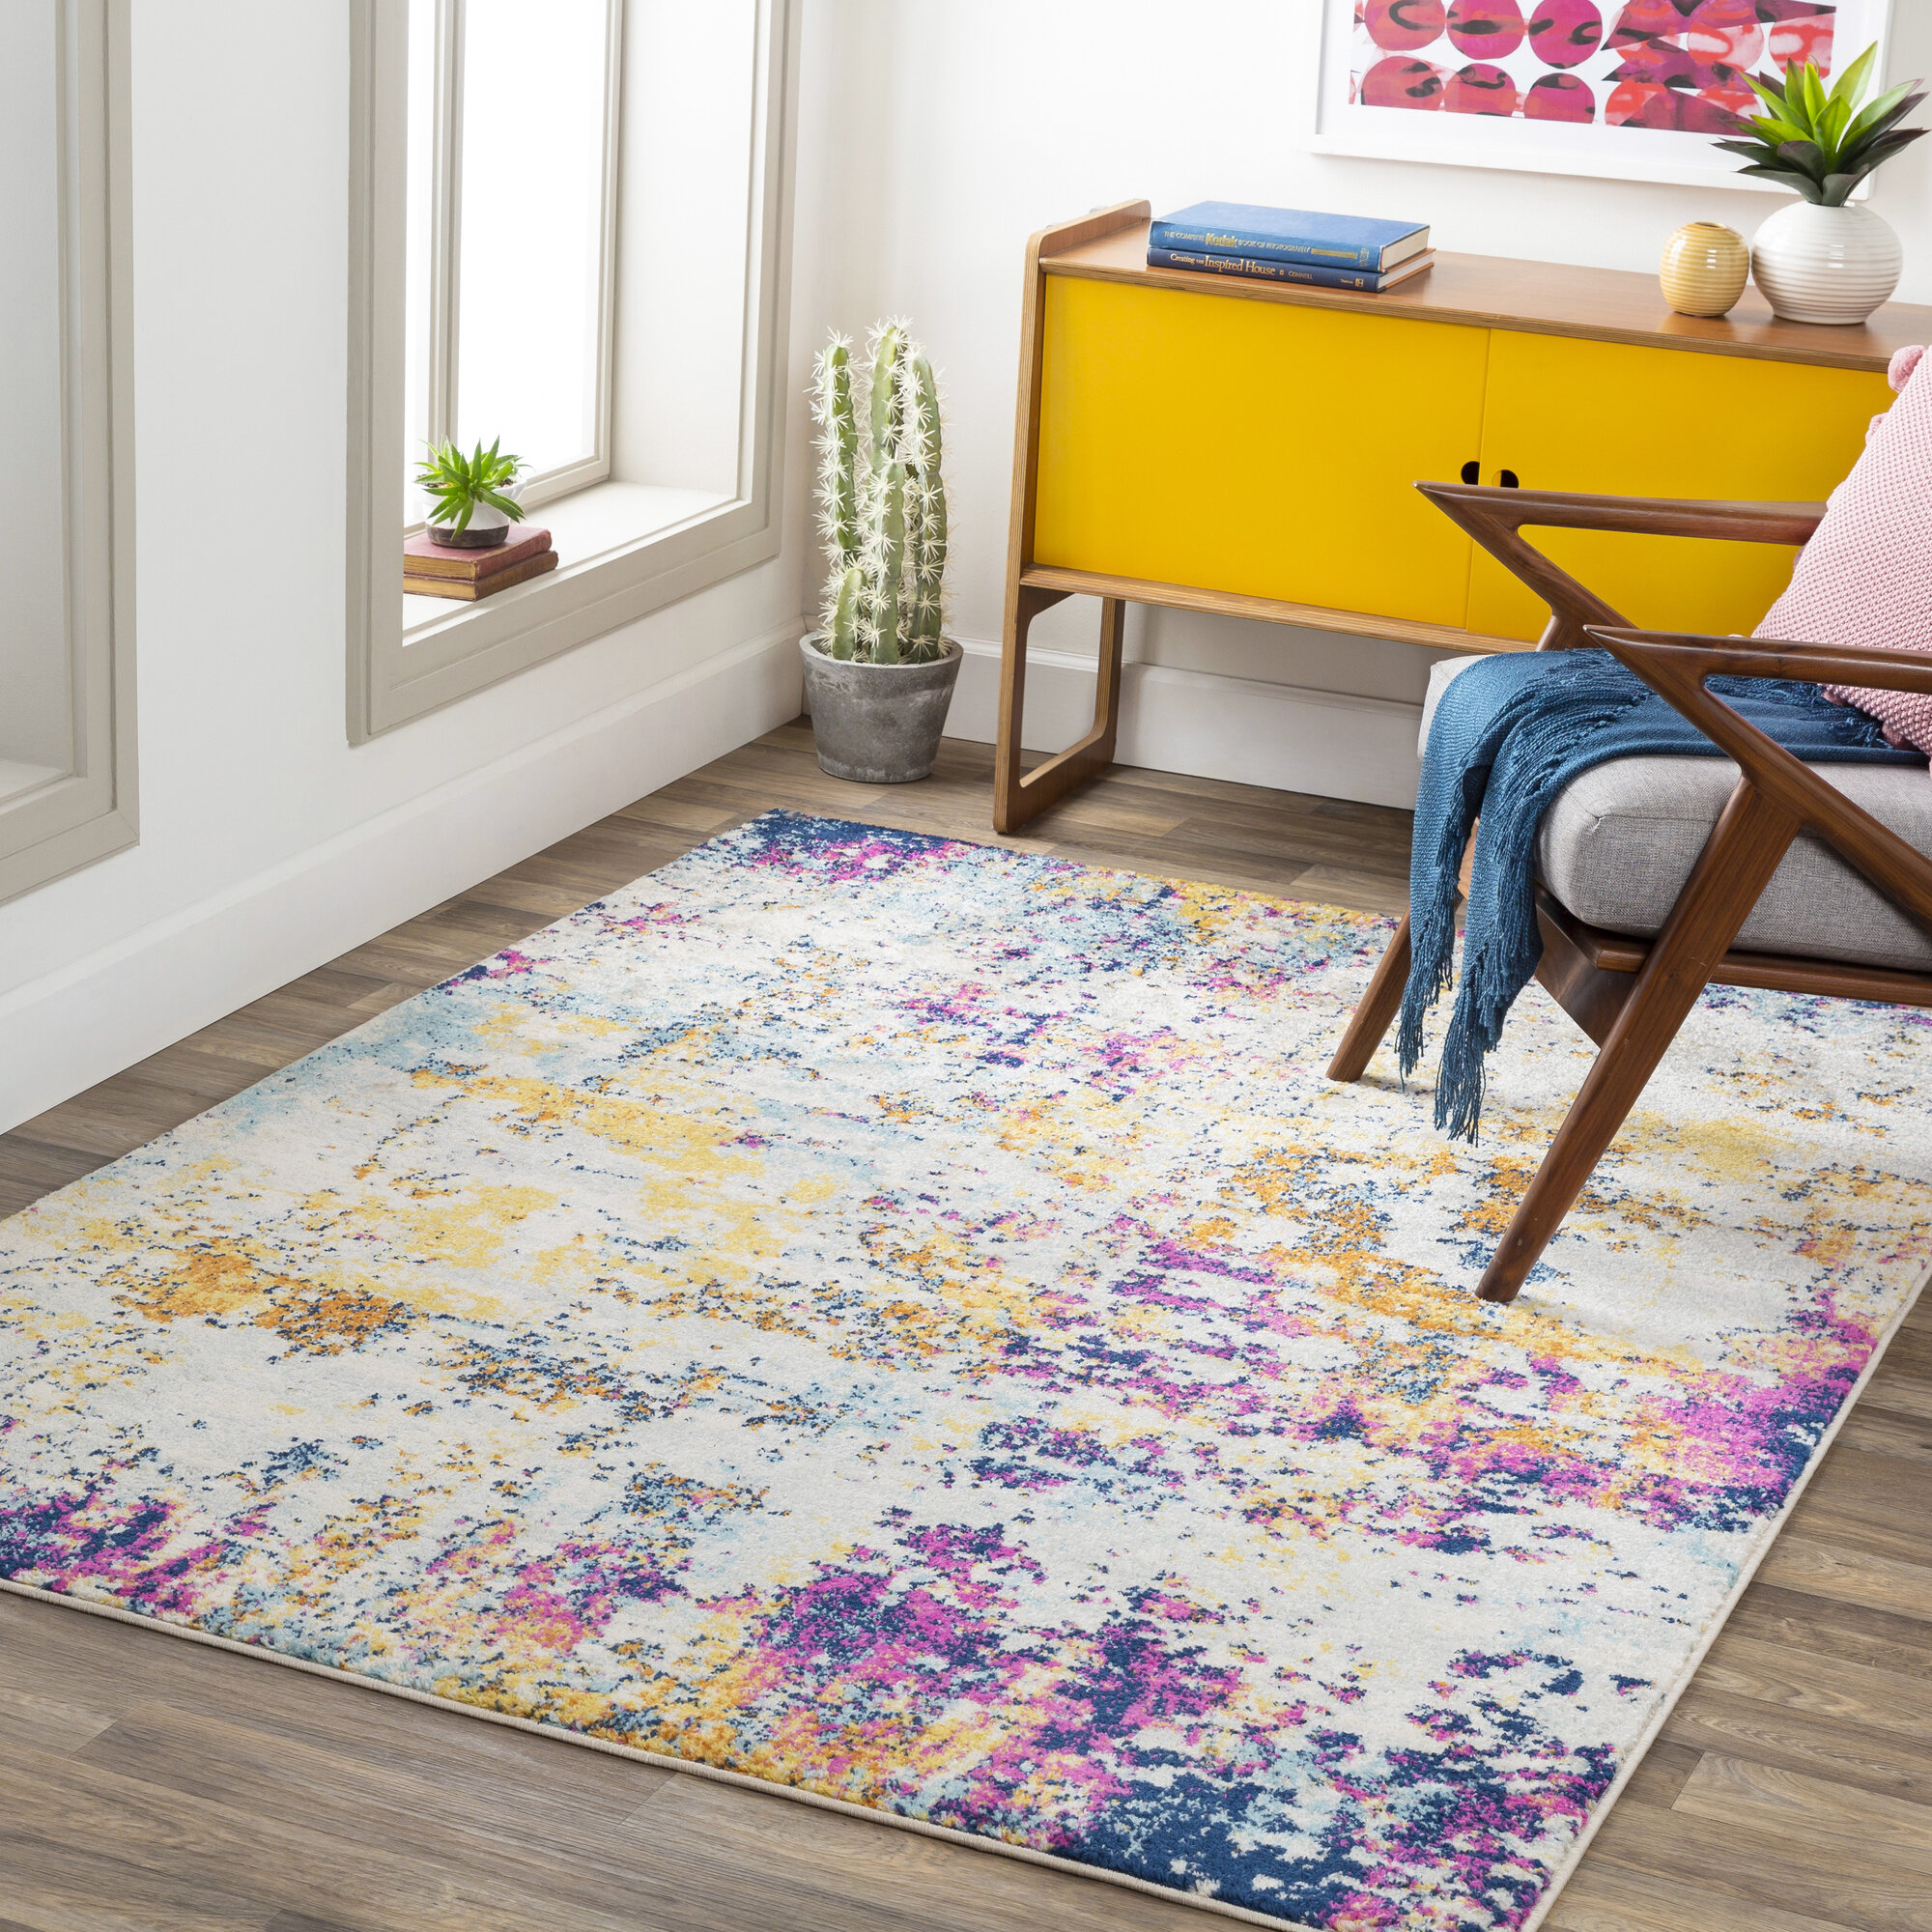 17 Stories Aubuchon Abstract Yellow Purple Blue Area Rug Reviews Wayfair